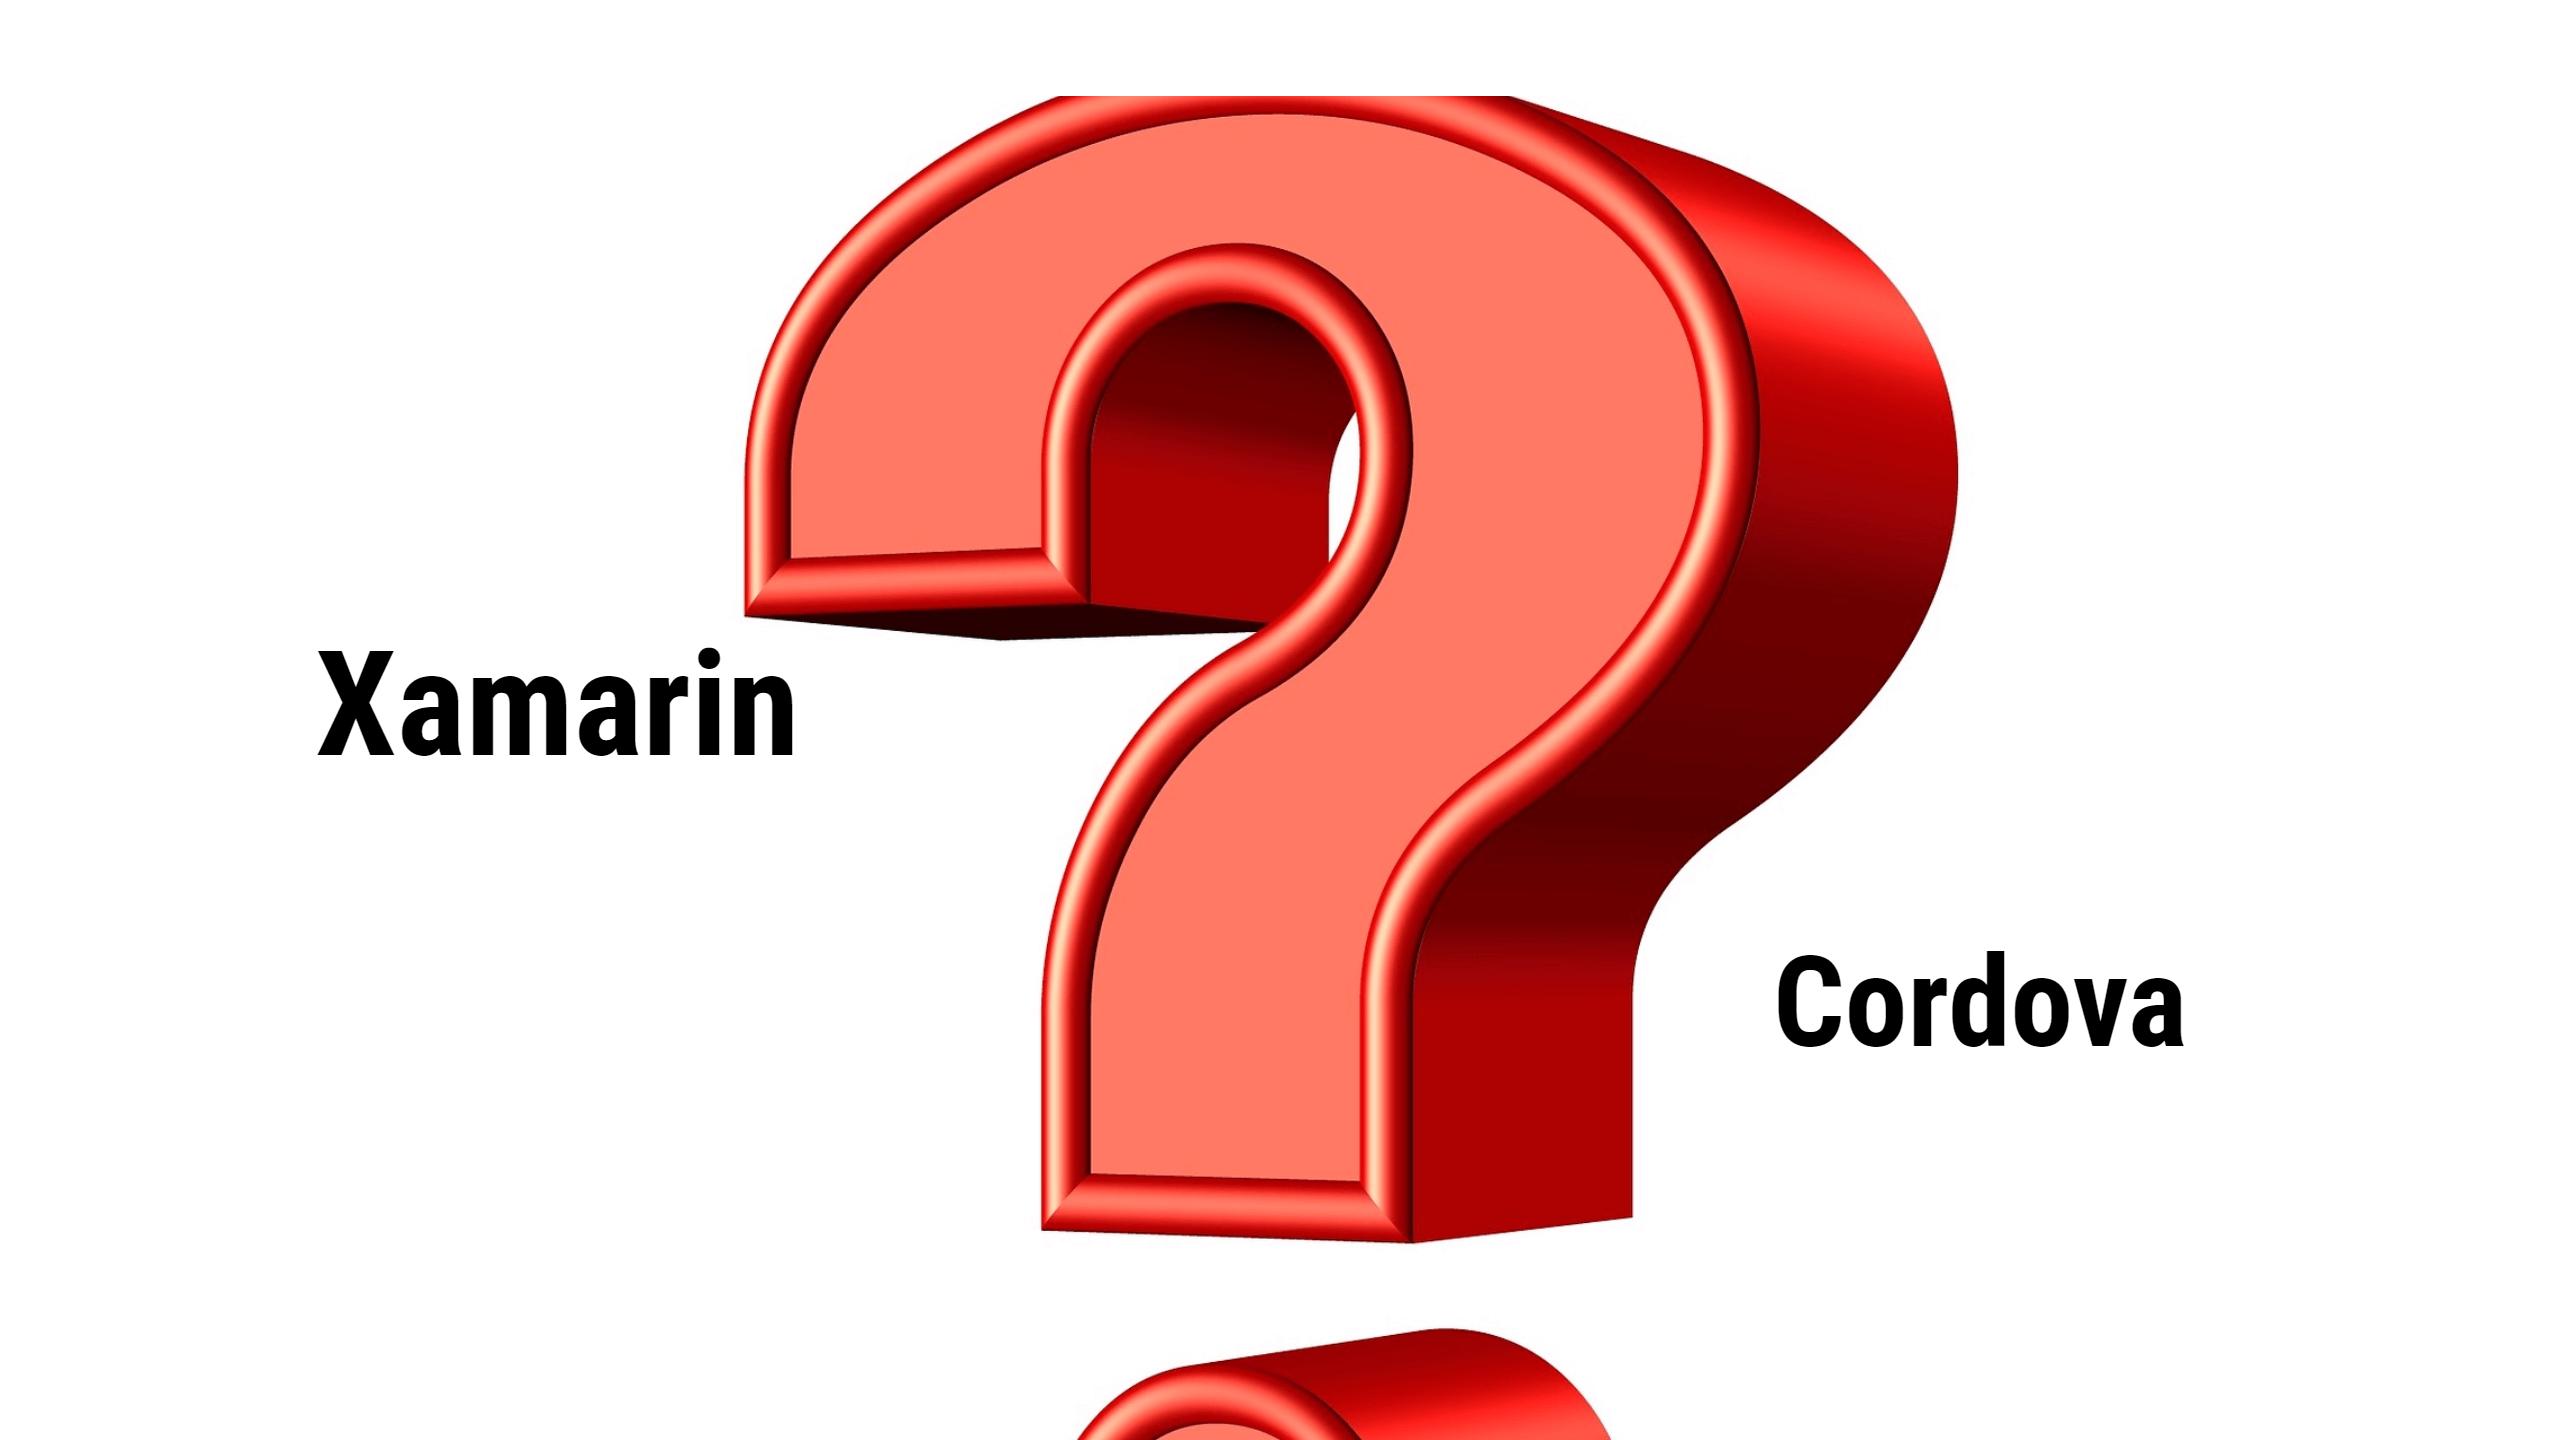 Is Xamarin or Apache Cordova better? - Quora